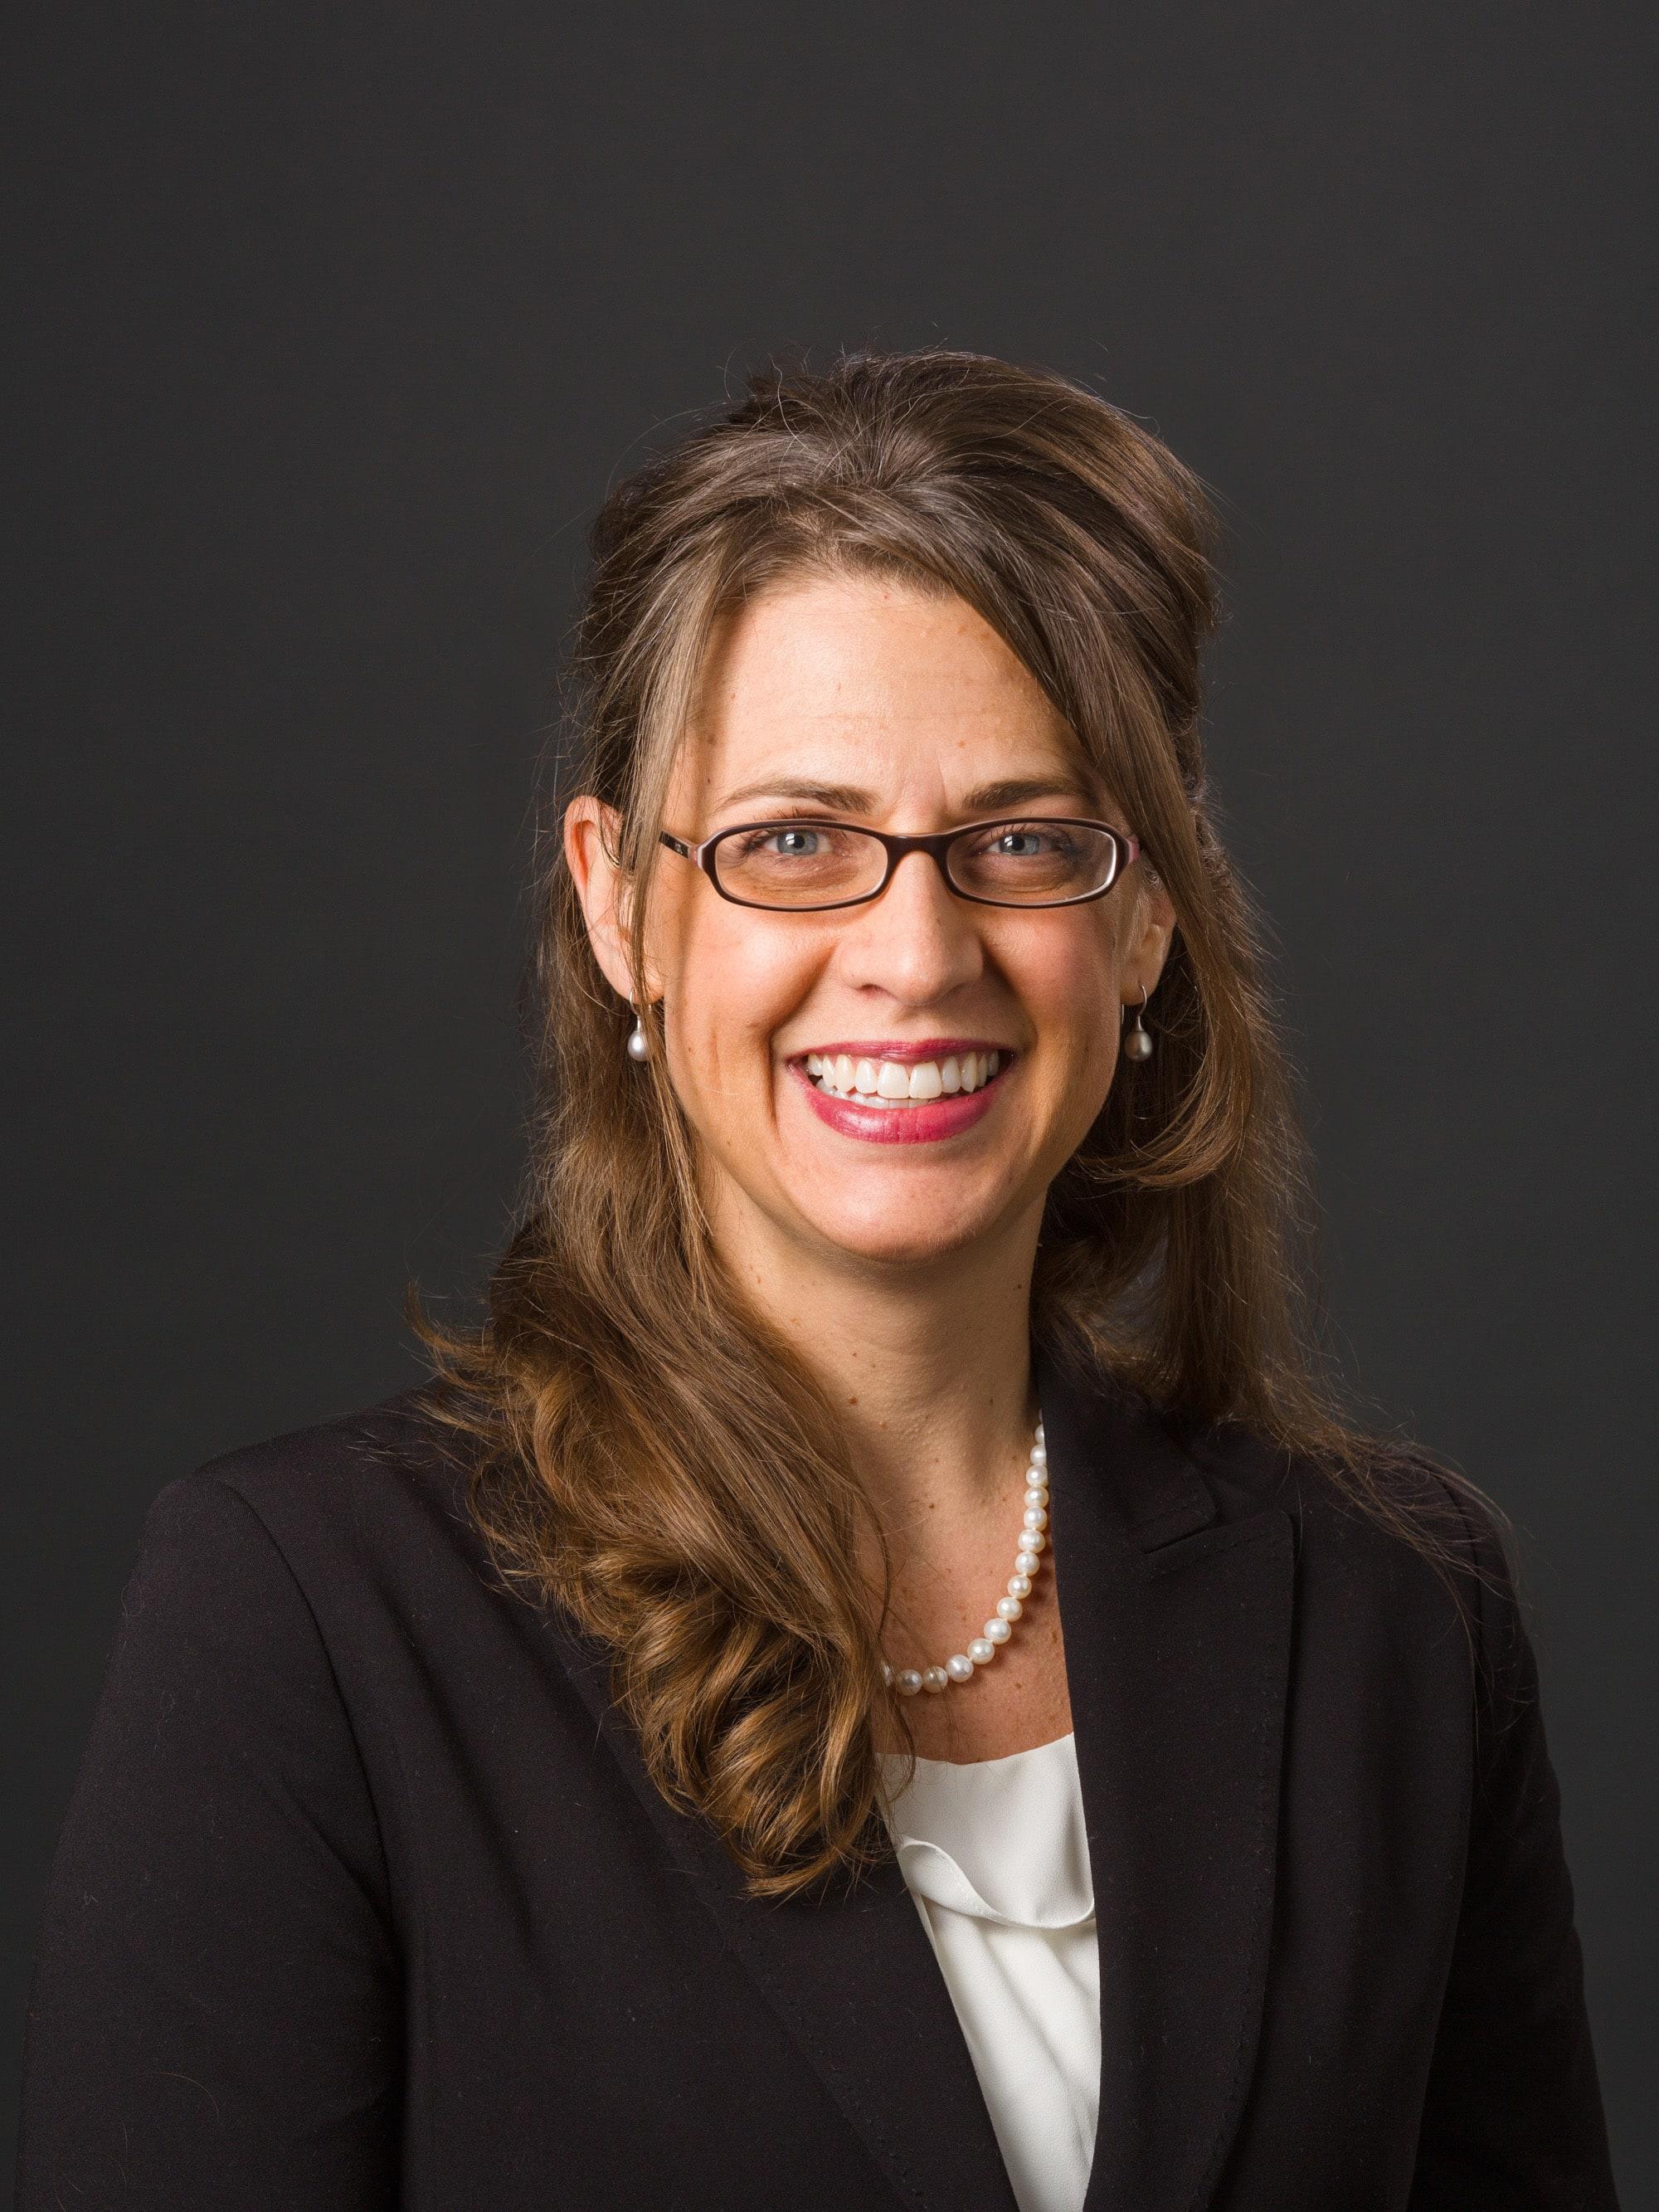 Katherine DeStefano